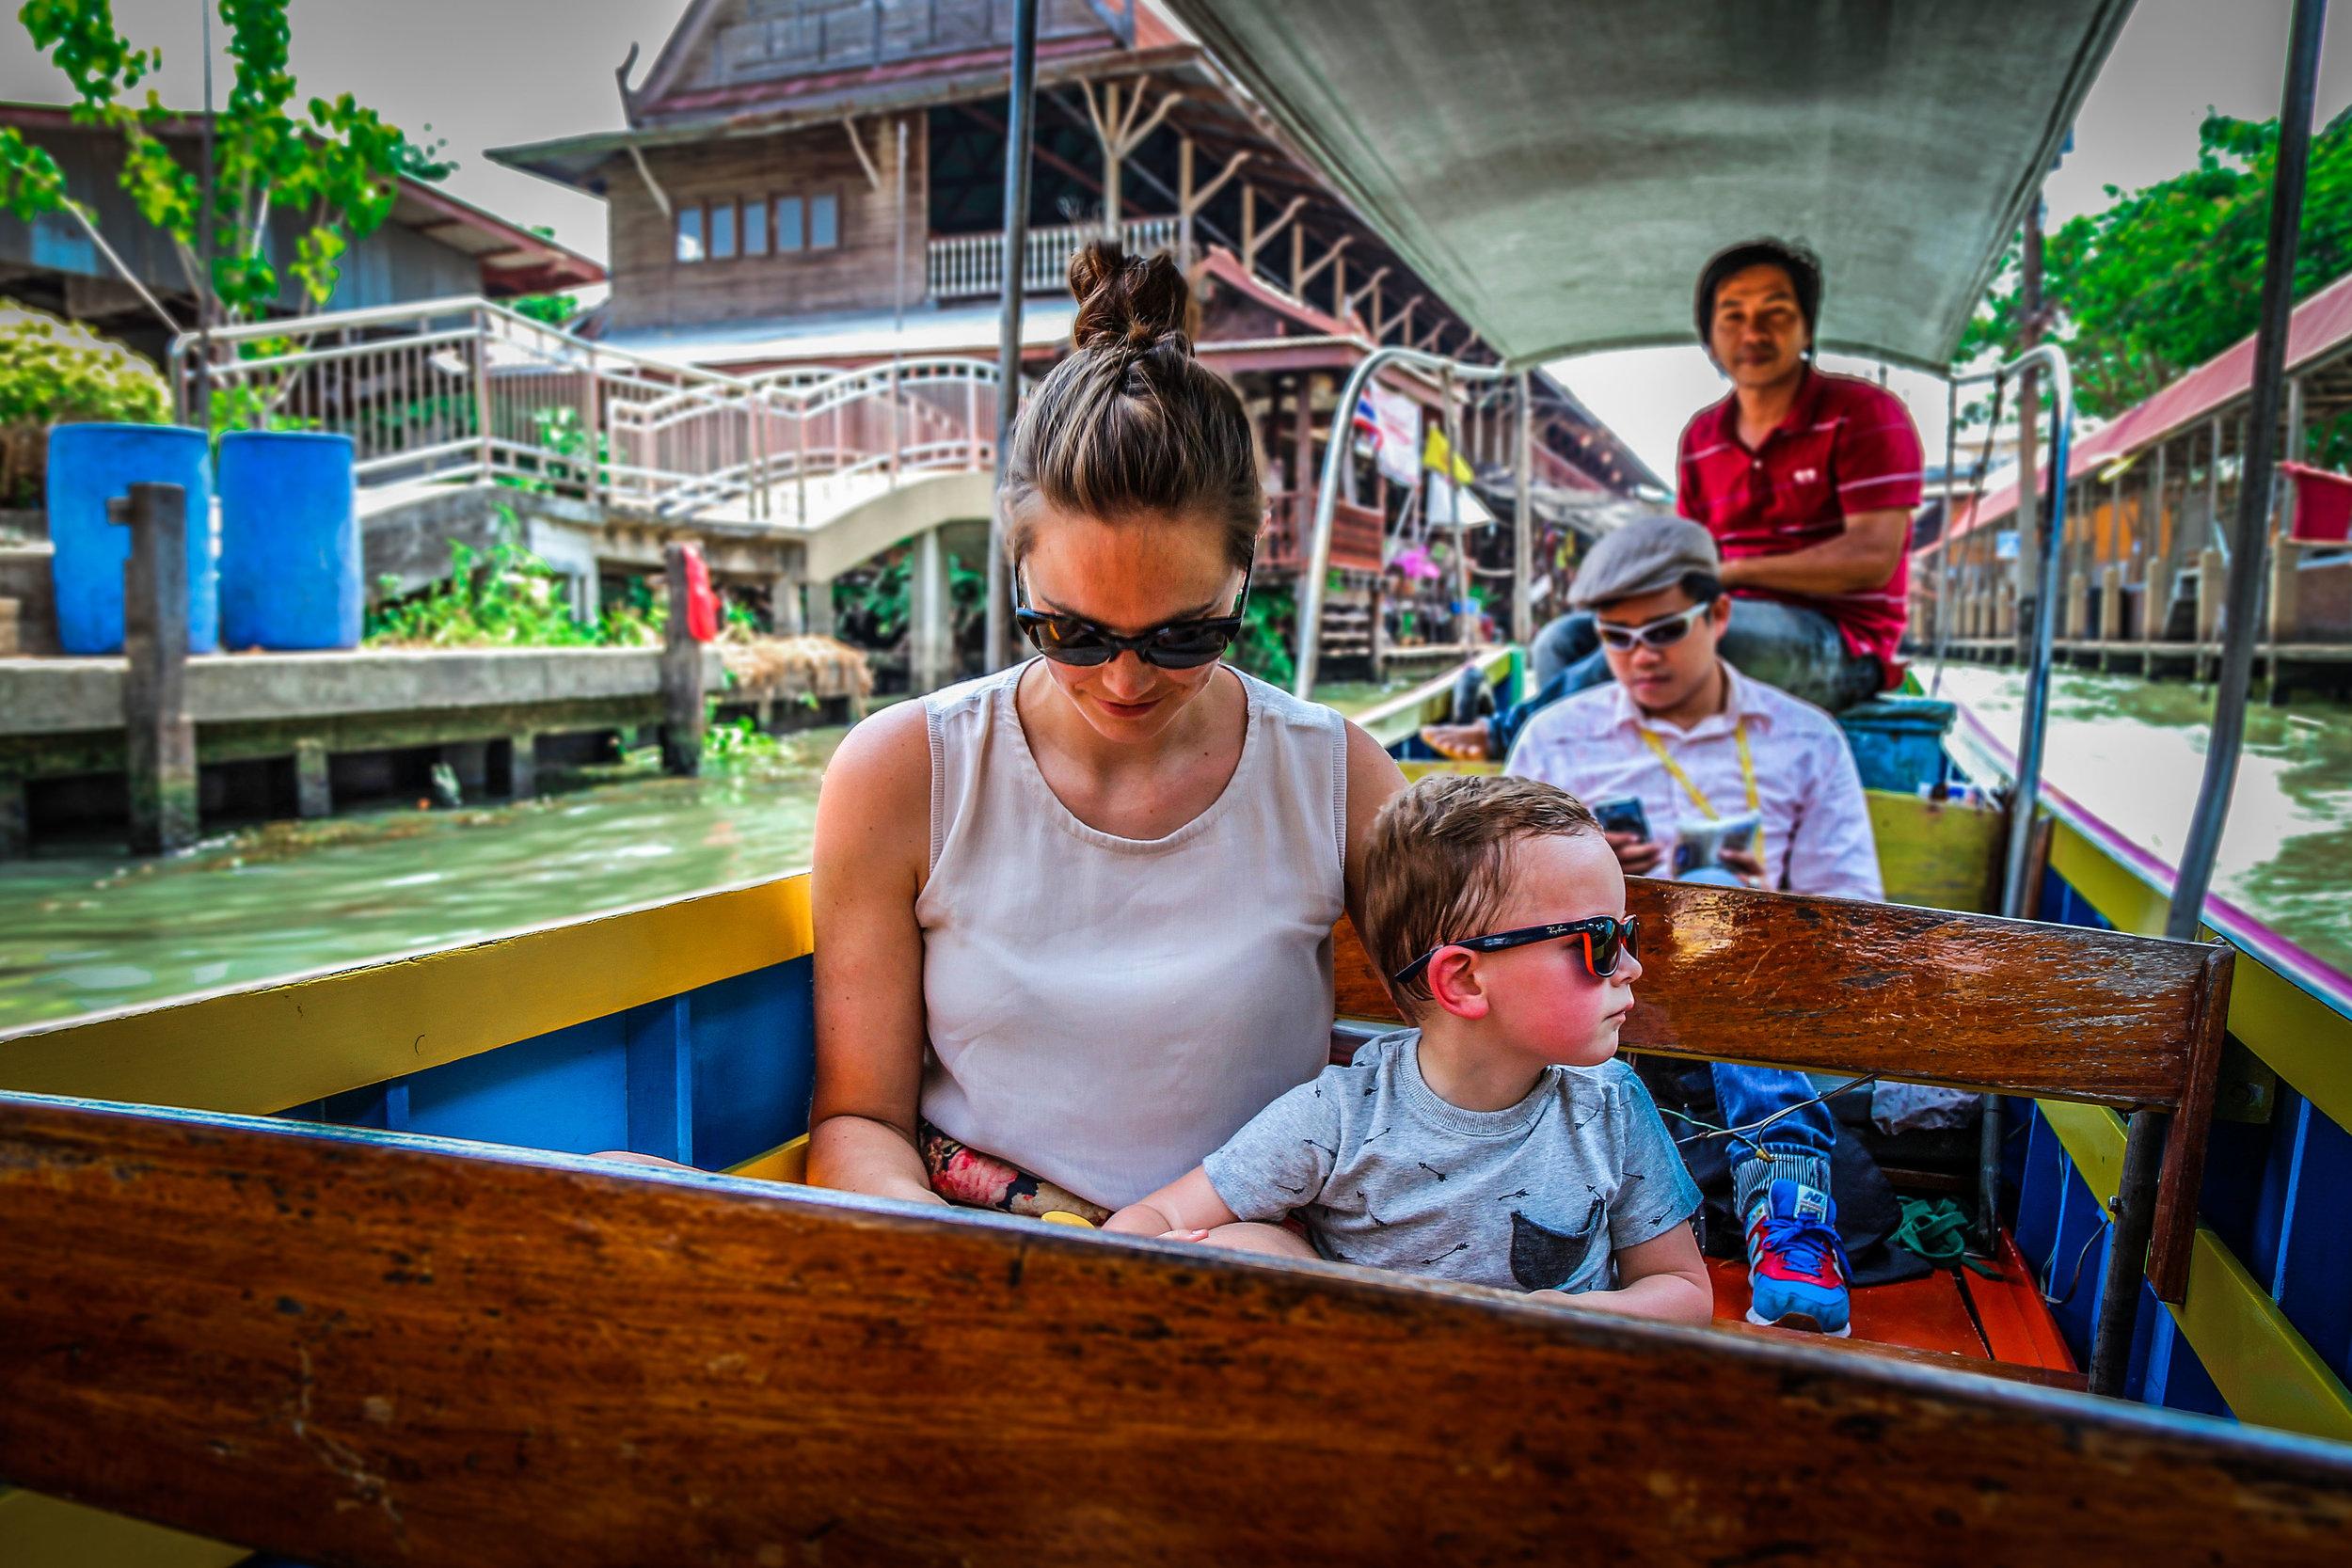 Bangkok - Damnoen Saduak  - Reizen met kinderen - withkidsontheroad-7.jpg